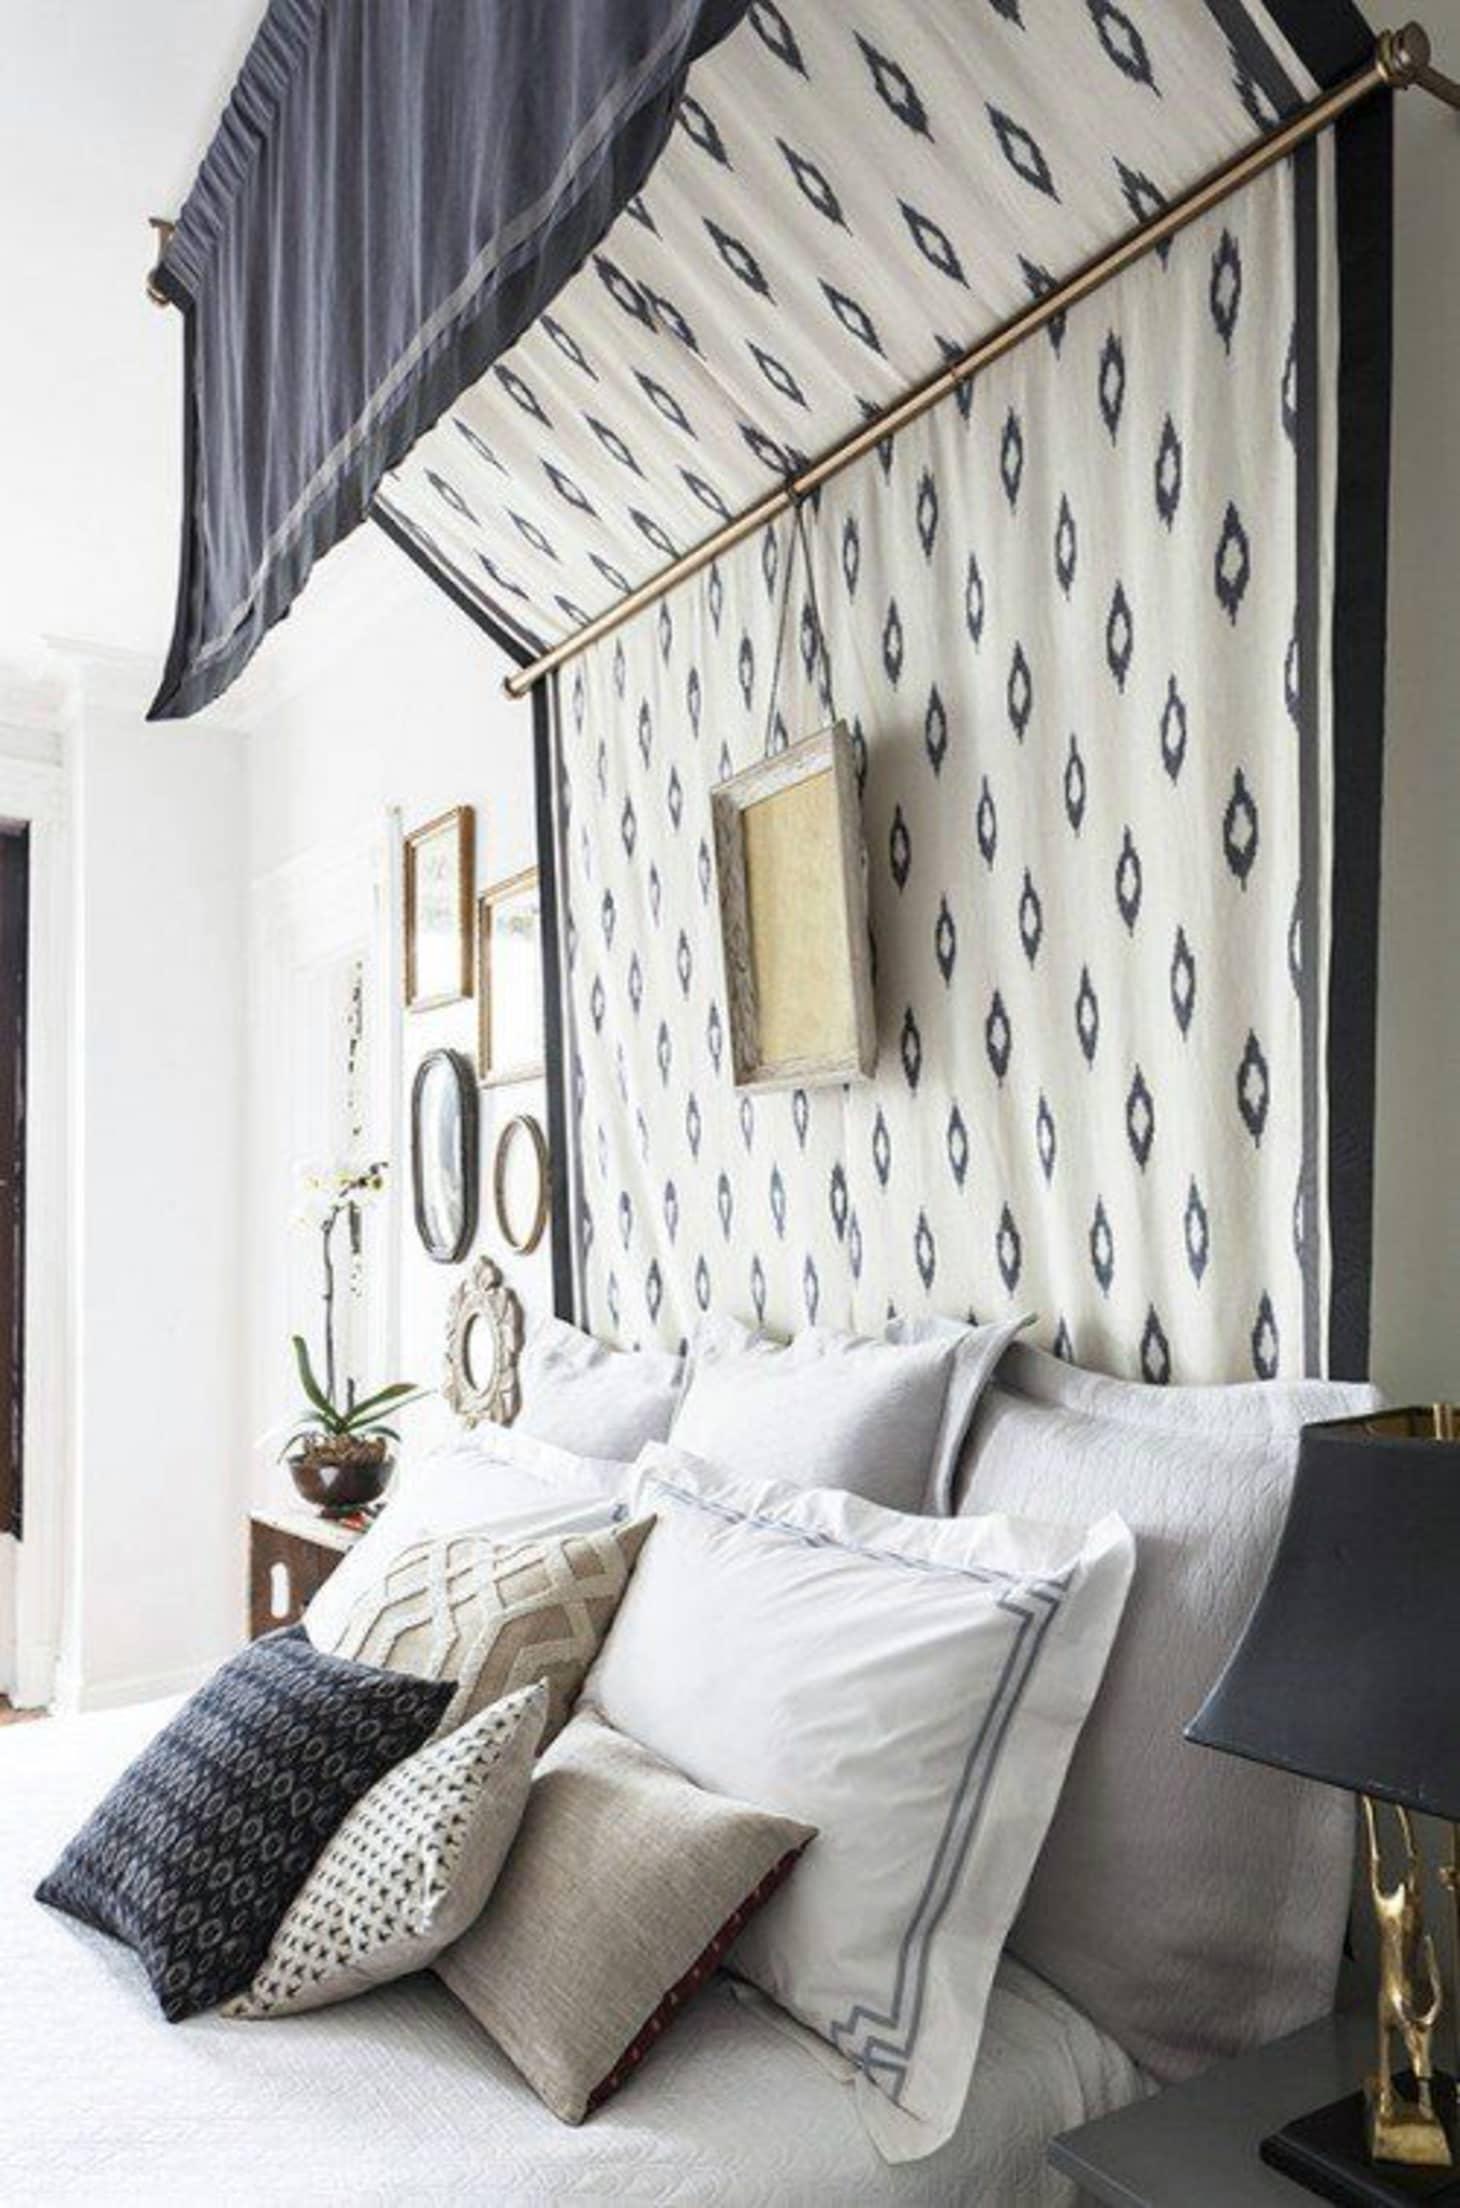 20+ Easy DIY Homemade Headboard Ideas - How to Make a Bed ...